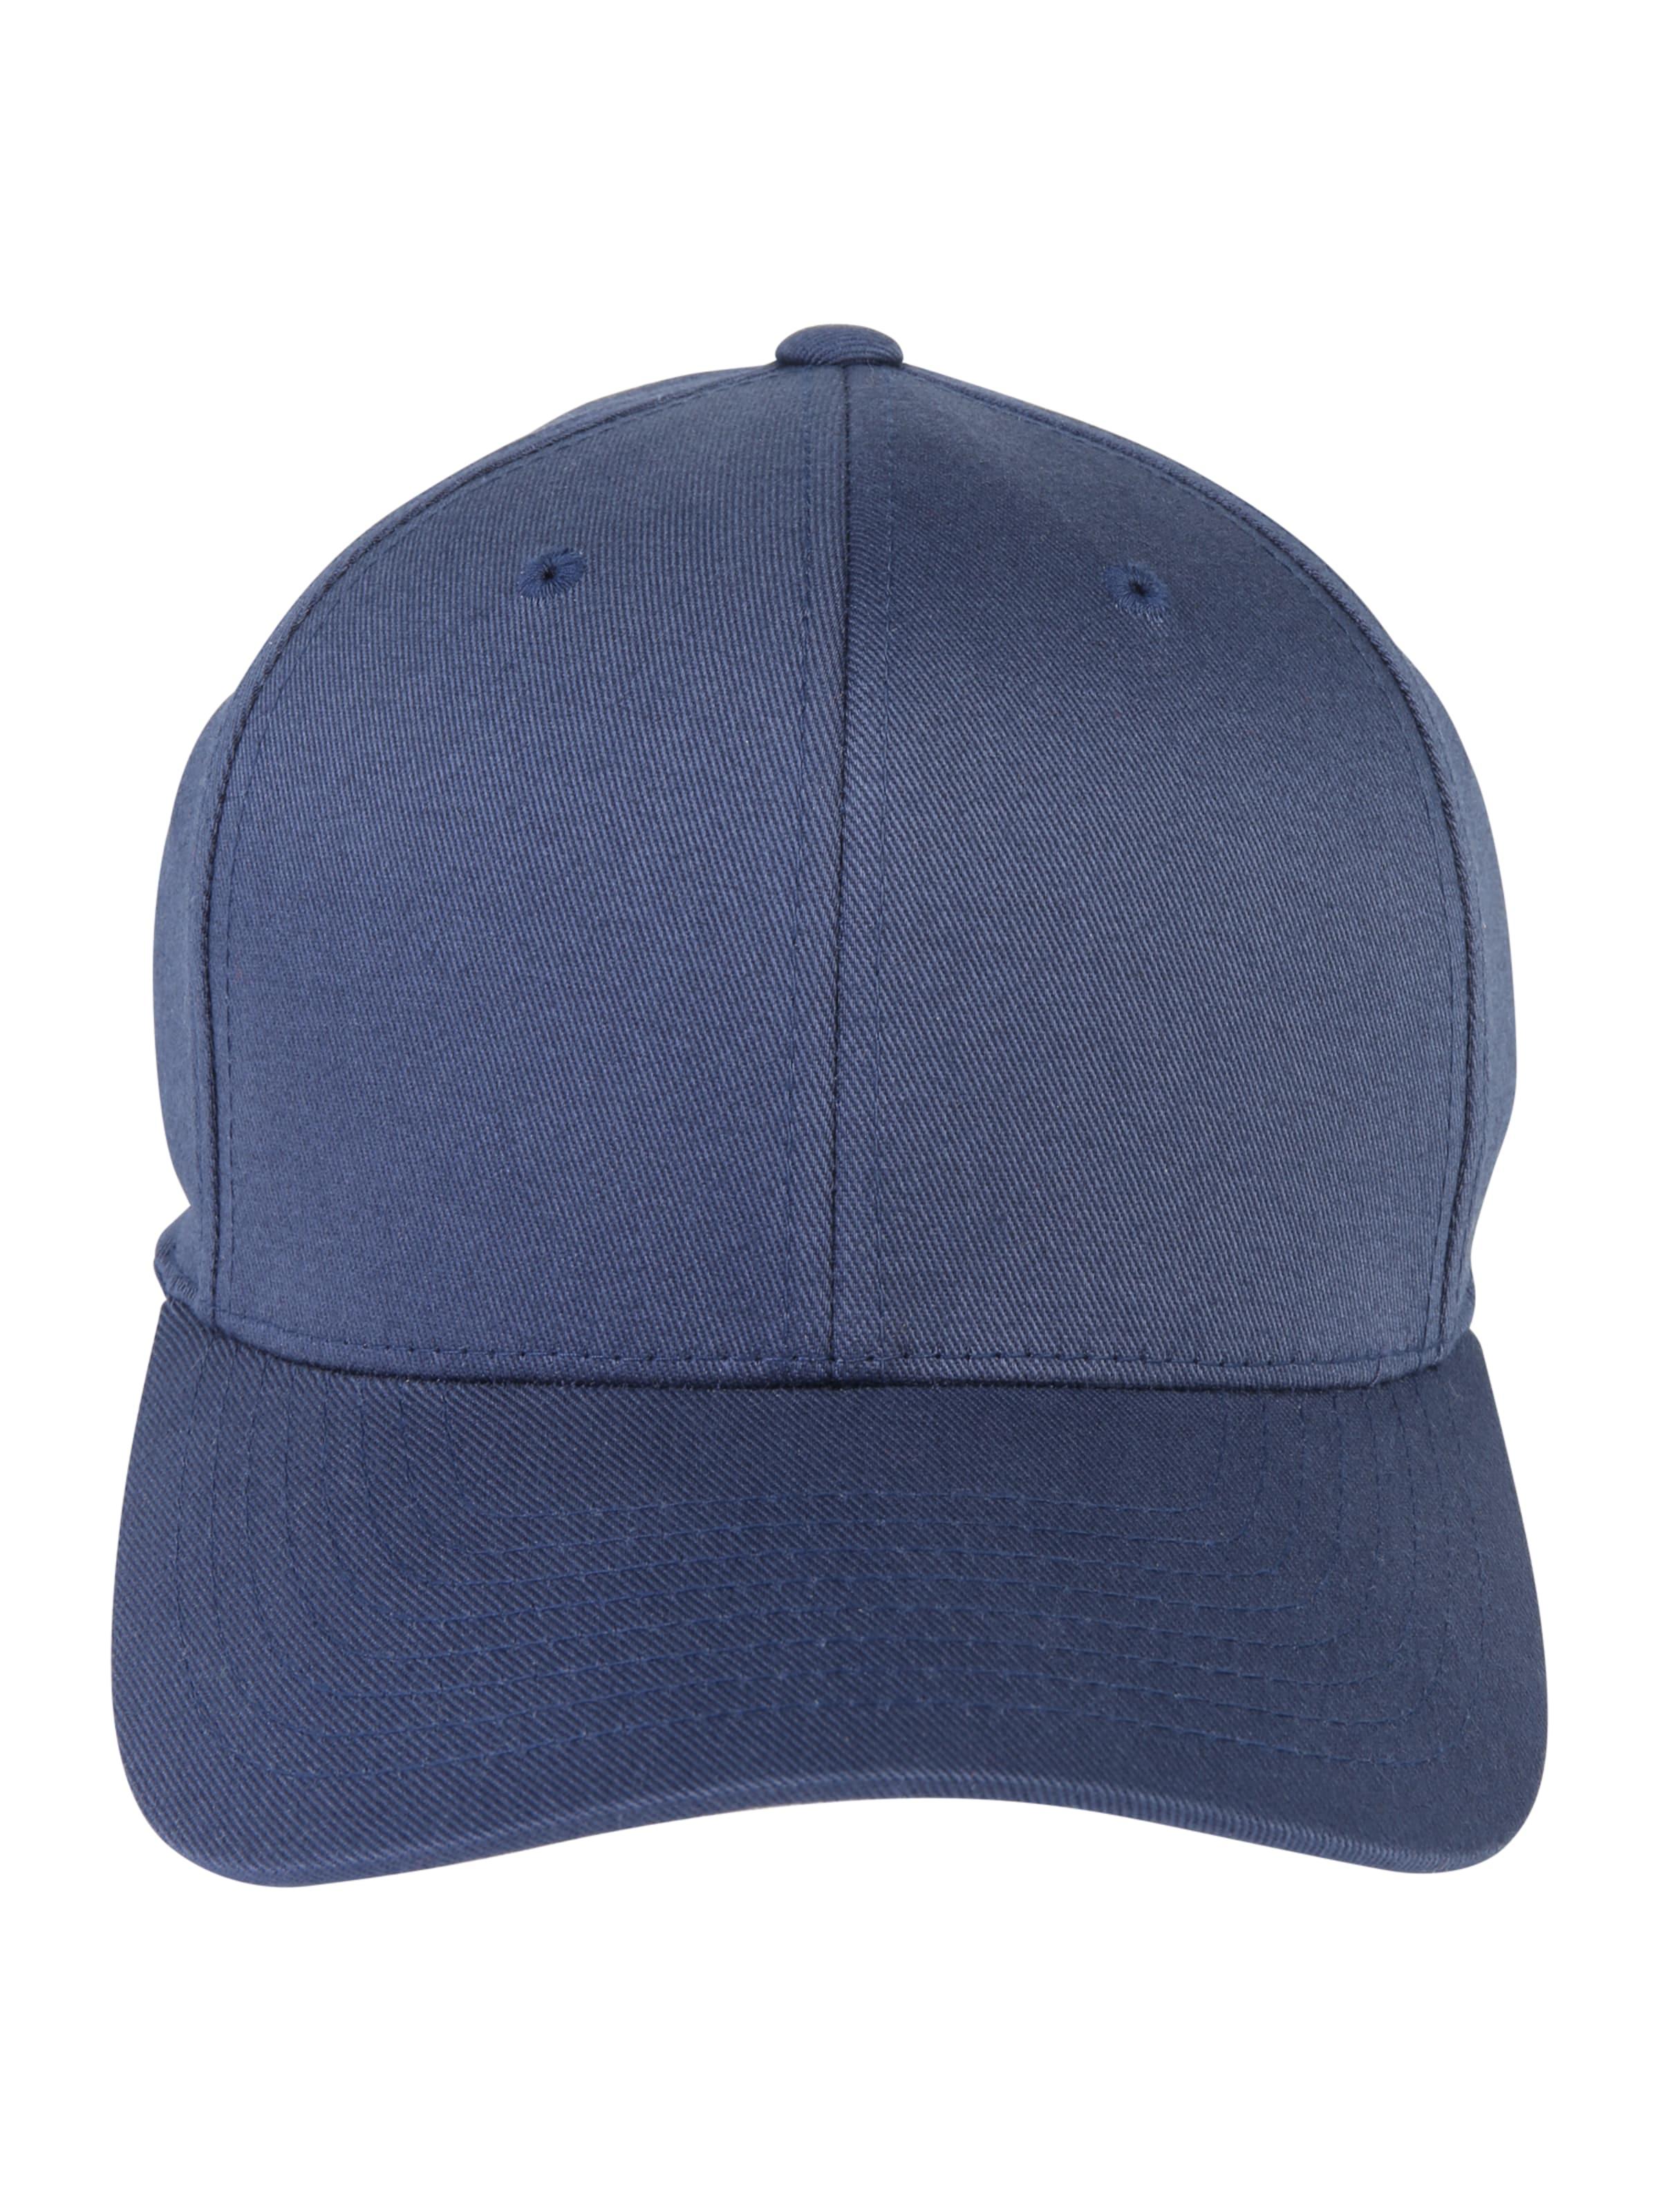 Flexfit Navy 'flexfit Cap Wooly In Combed' sdQxhrotCB